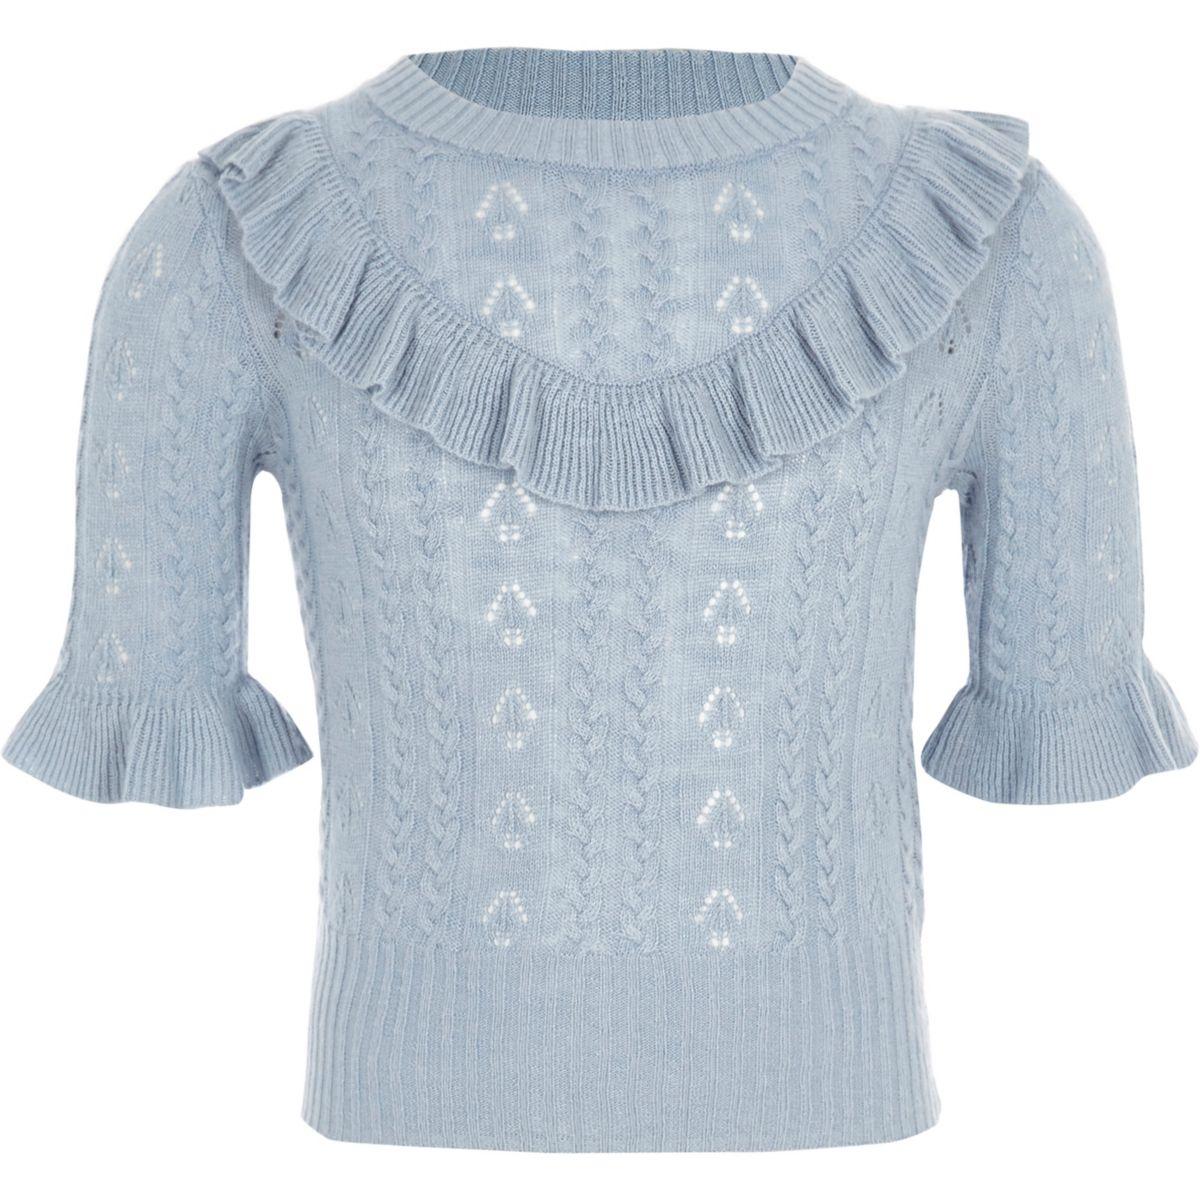 Girls light blue frill pointelle knit jumper